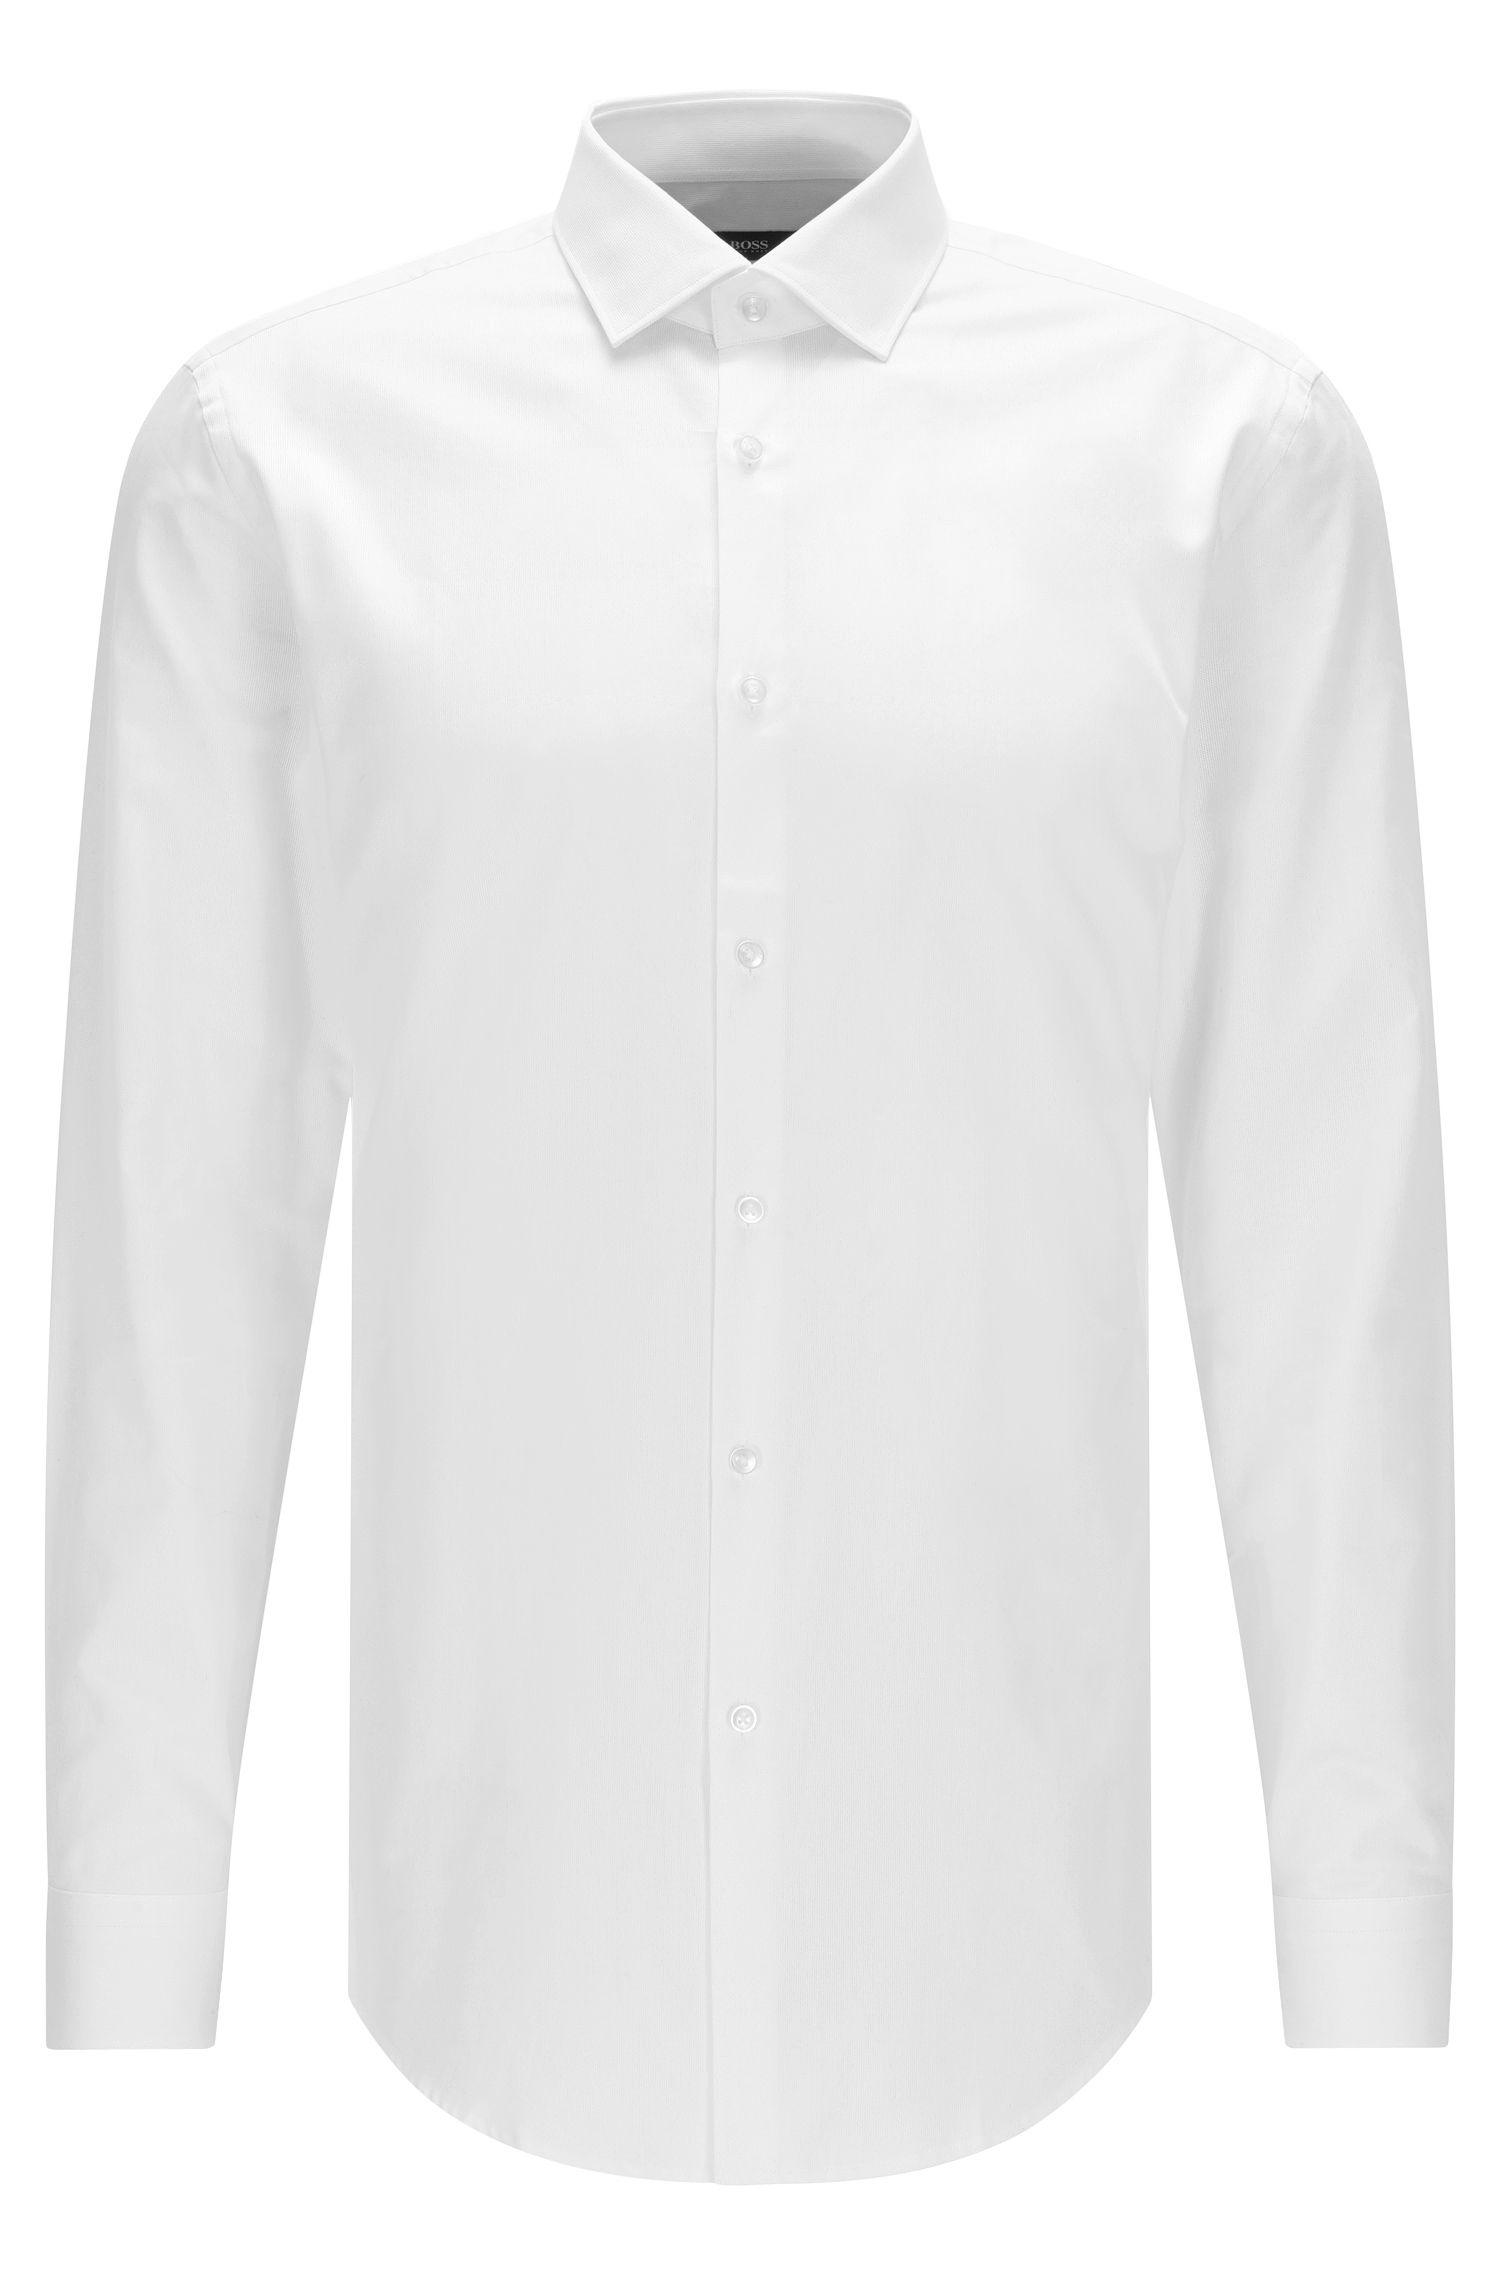 Cotton Dress Shirt, Slim Fit | Ismo